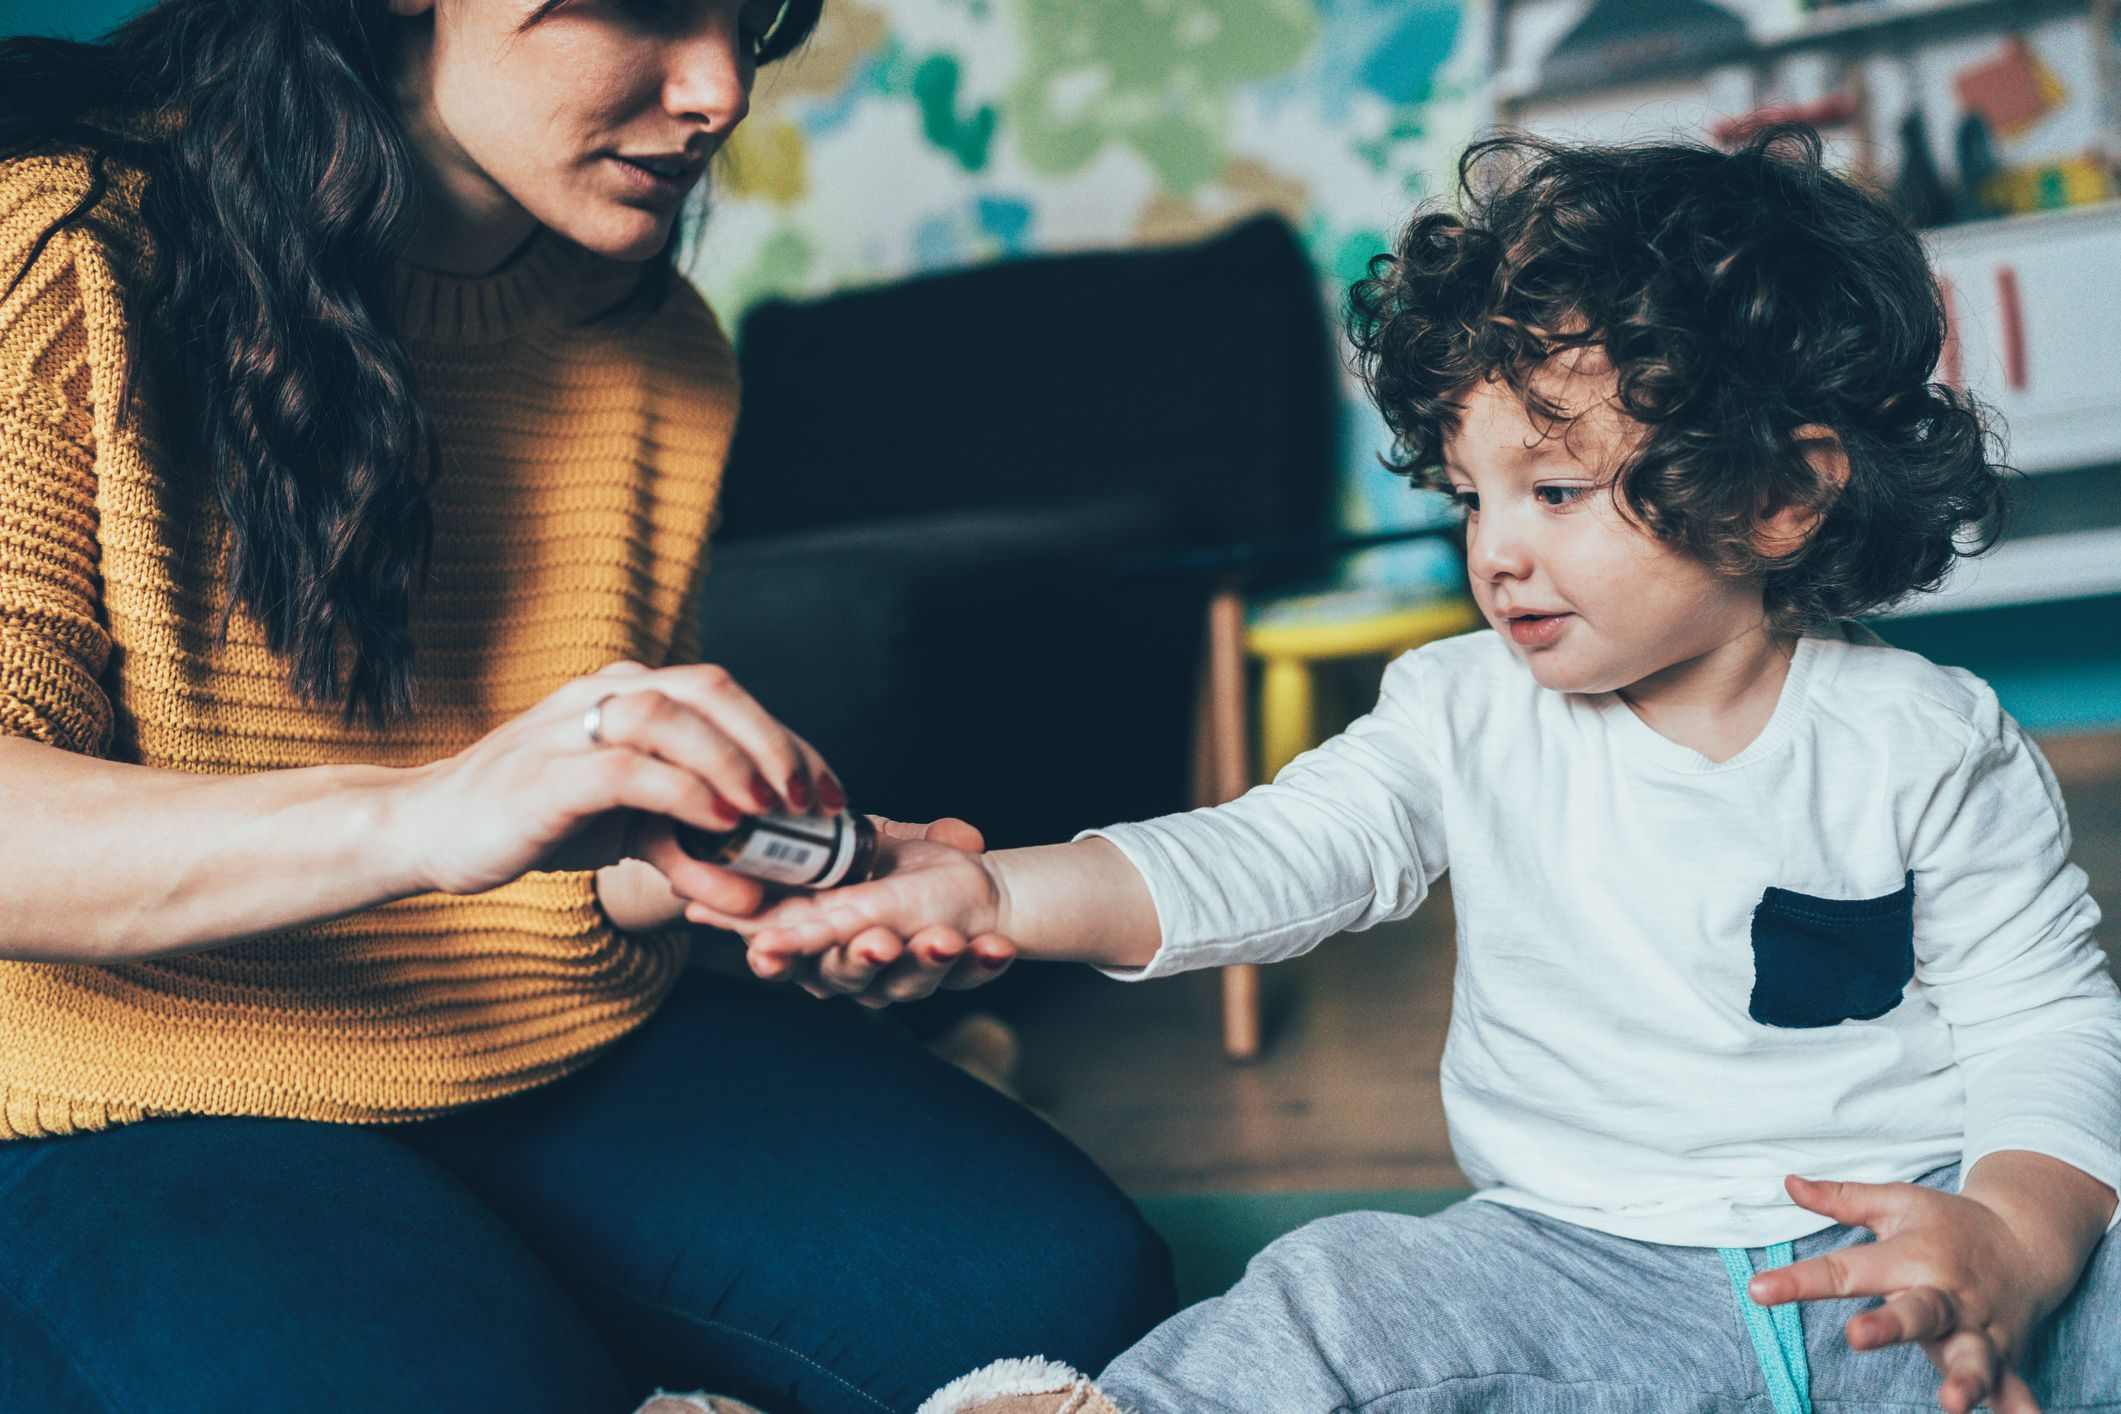 The 8 Best Children's Vitamins of 2019